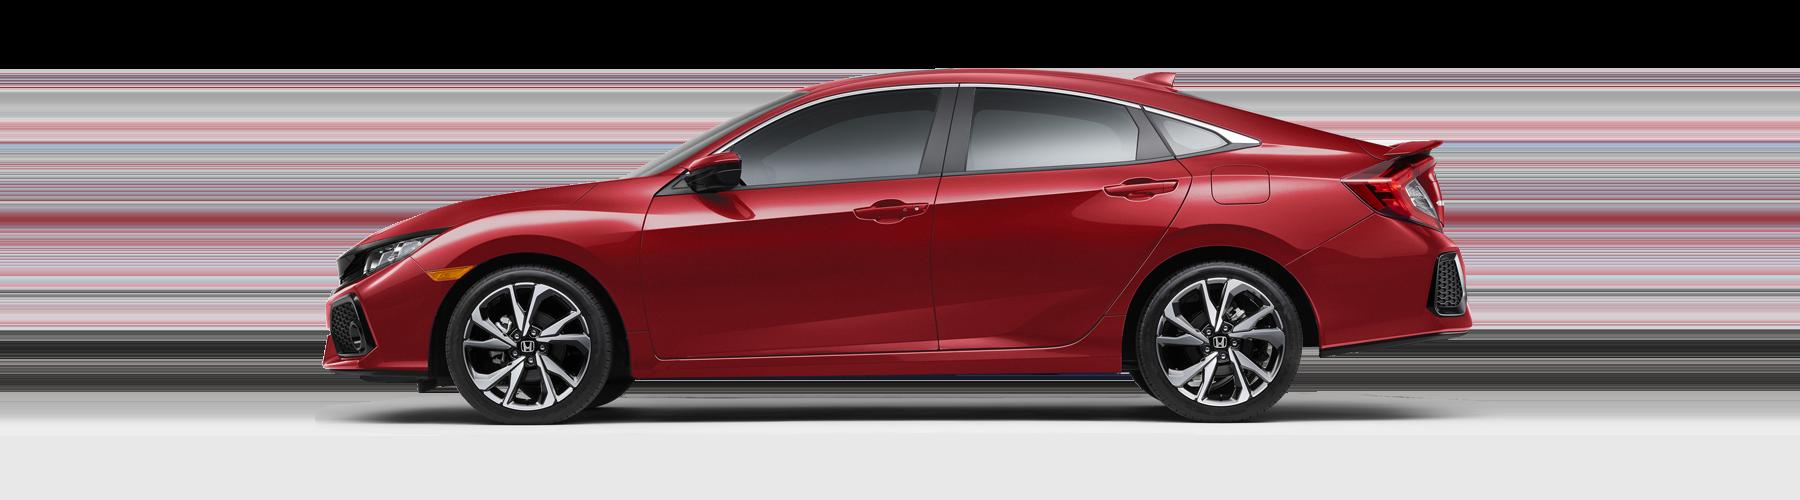 2017 Honda Civic Si Sedan Side Profile